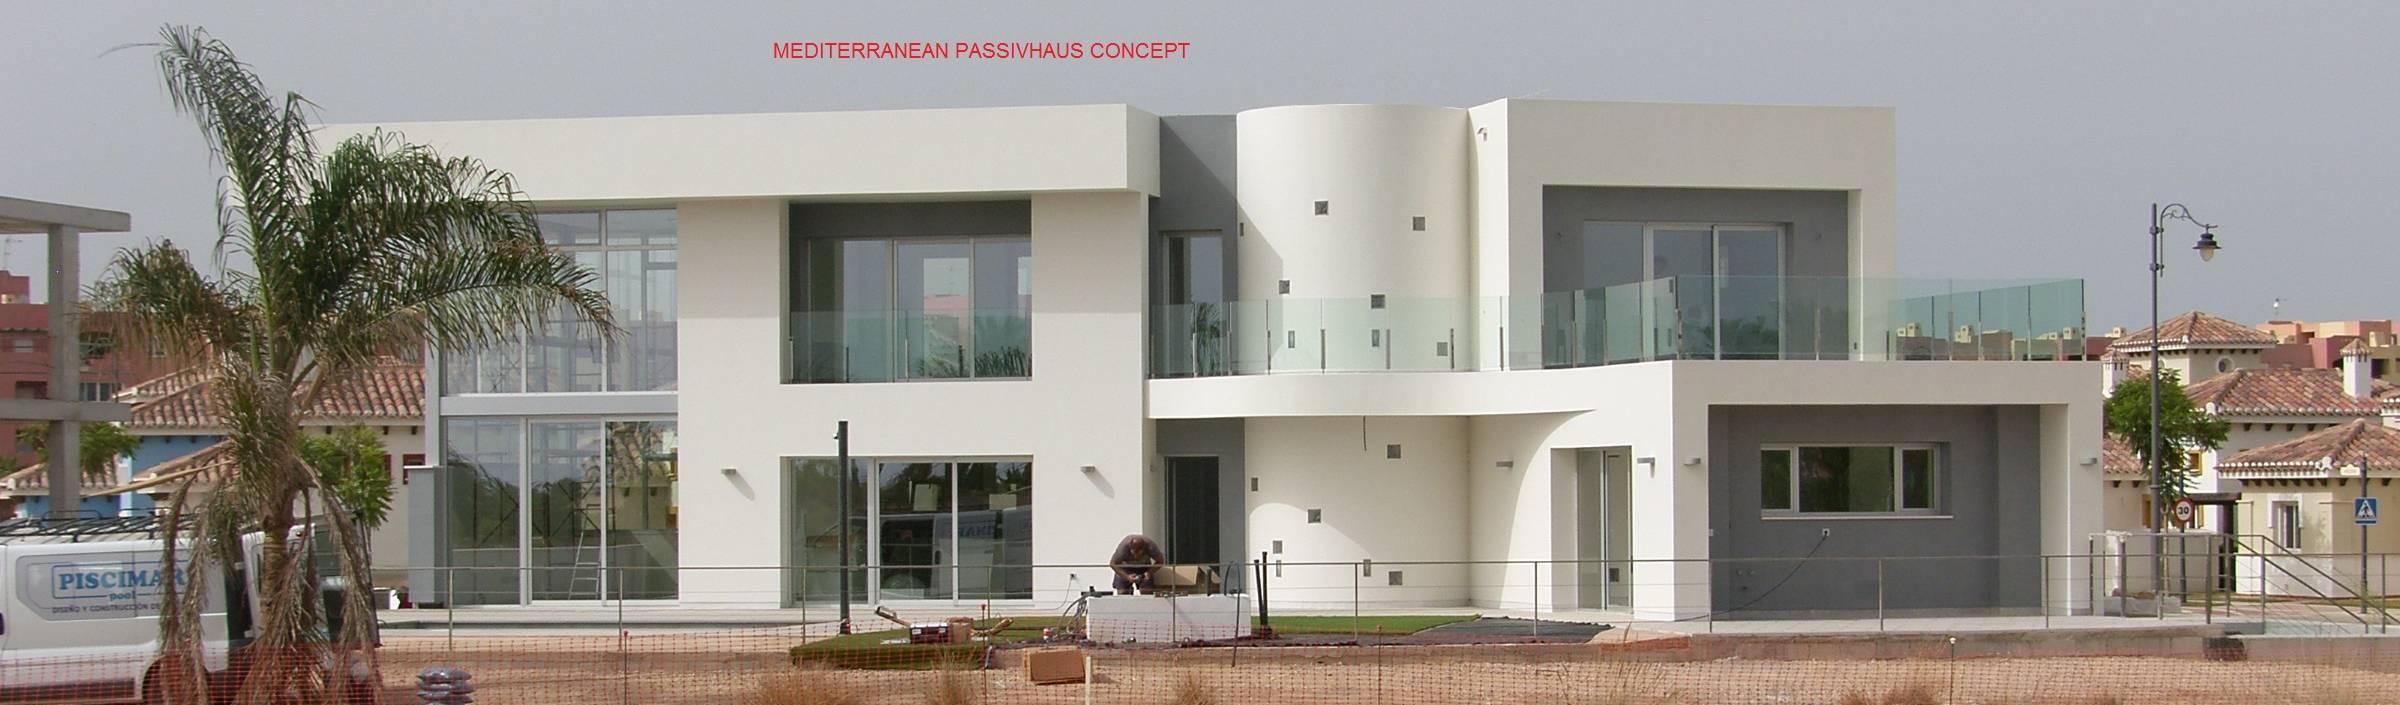 Arquitectura Mediterránea. Mediterranean Passivhaus Concept. 653773806 .